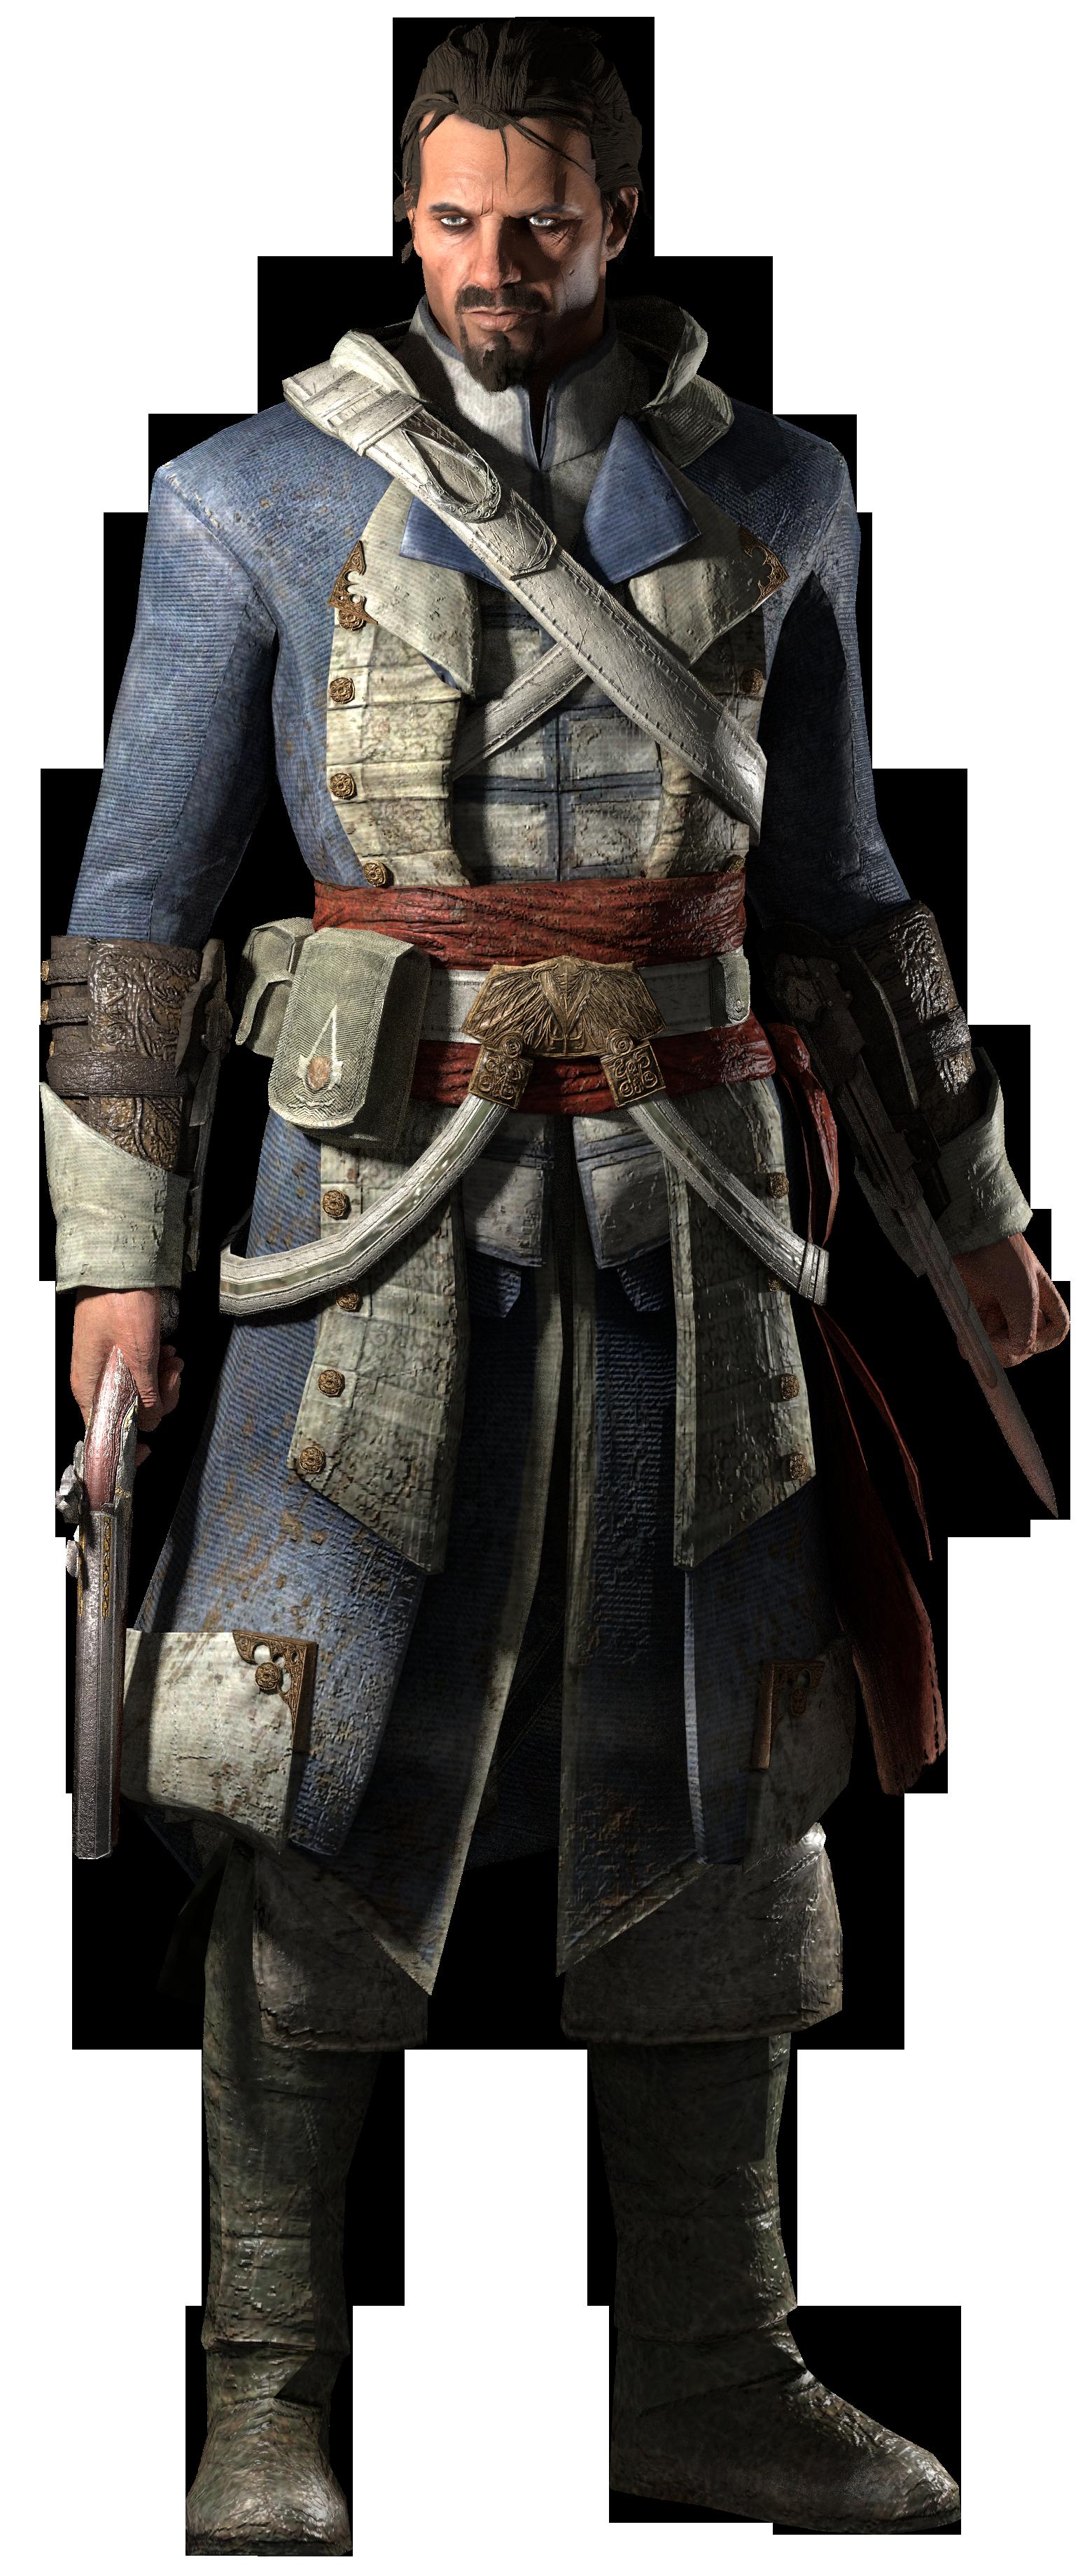 Duncan Walpole | Assassin's Creed Wiki | FANDOM powered by ...